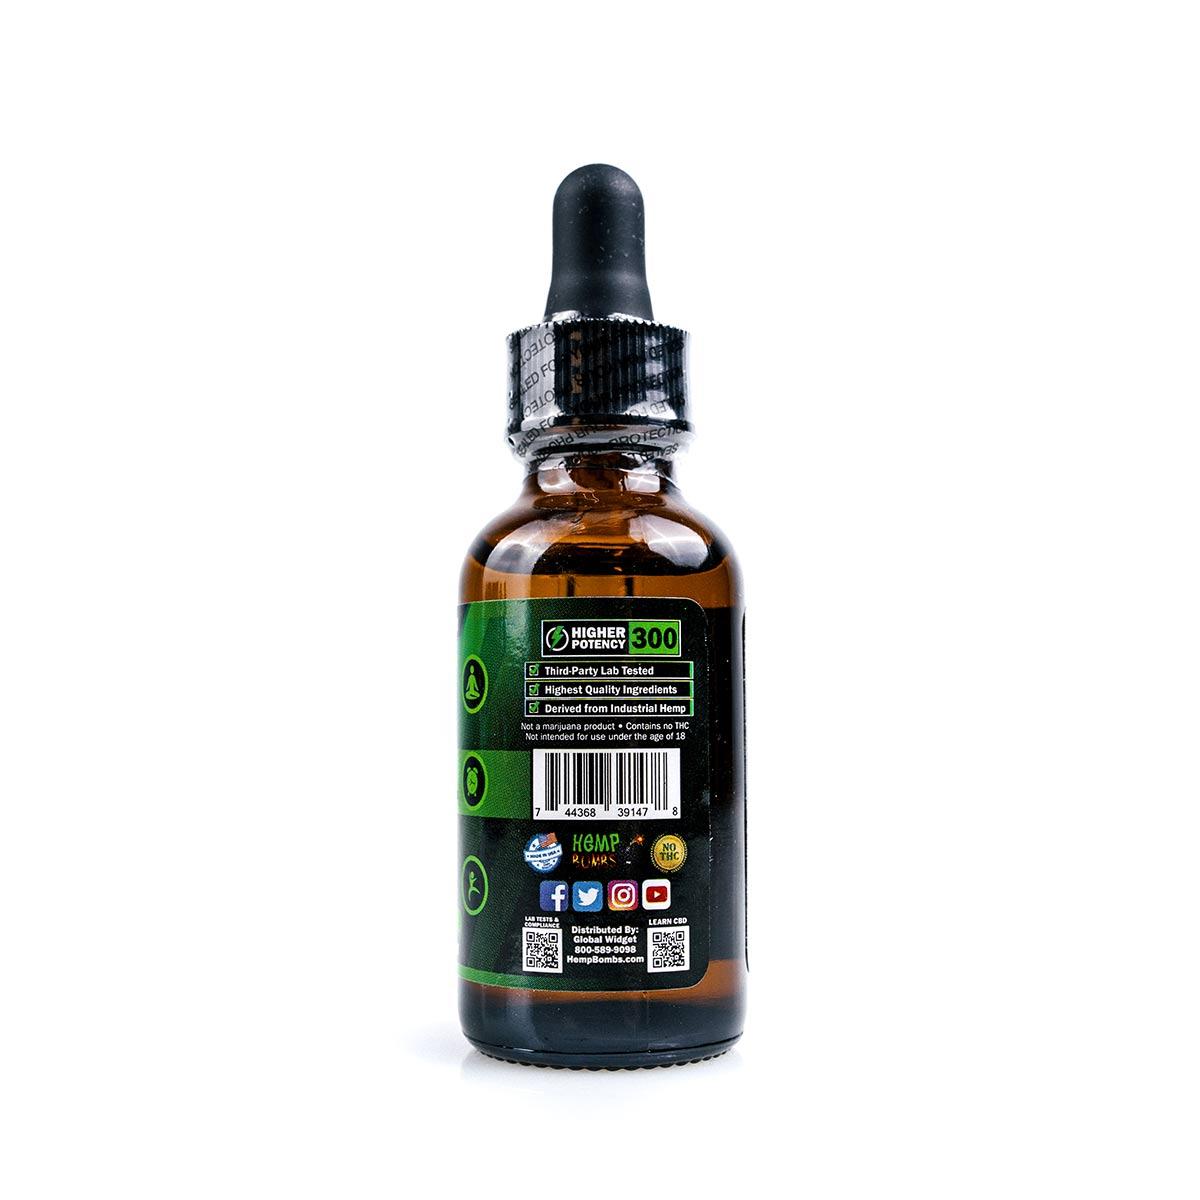 Hemp-Bombs,-CBD-Oil,-Broad-Spectrum-THC-free,-Peppermint,-1oz,-300mg-of-CBD-back